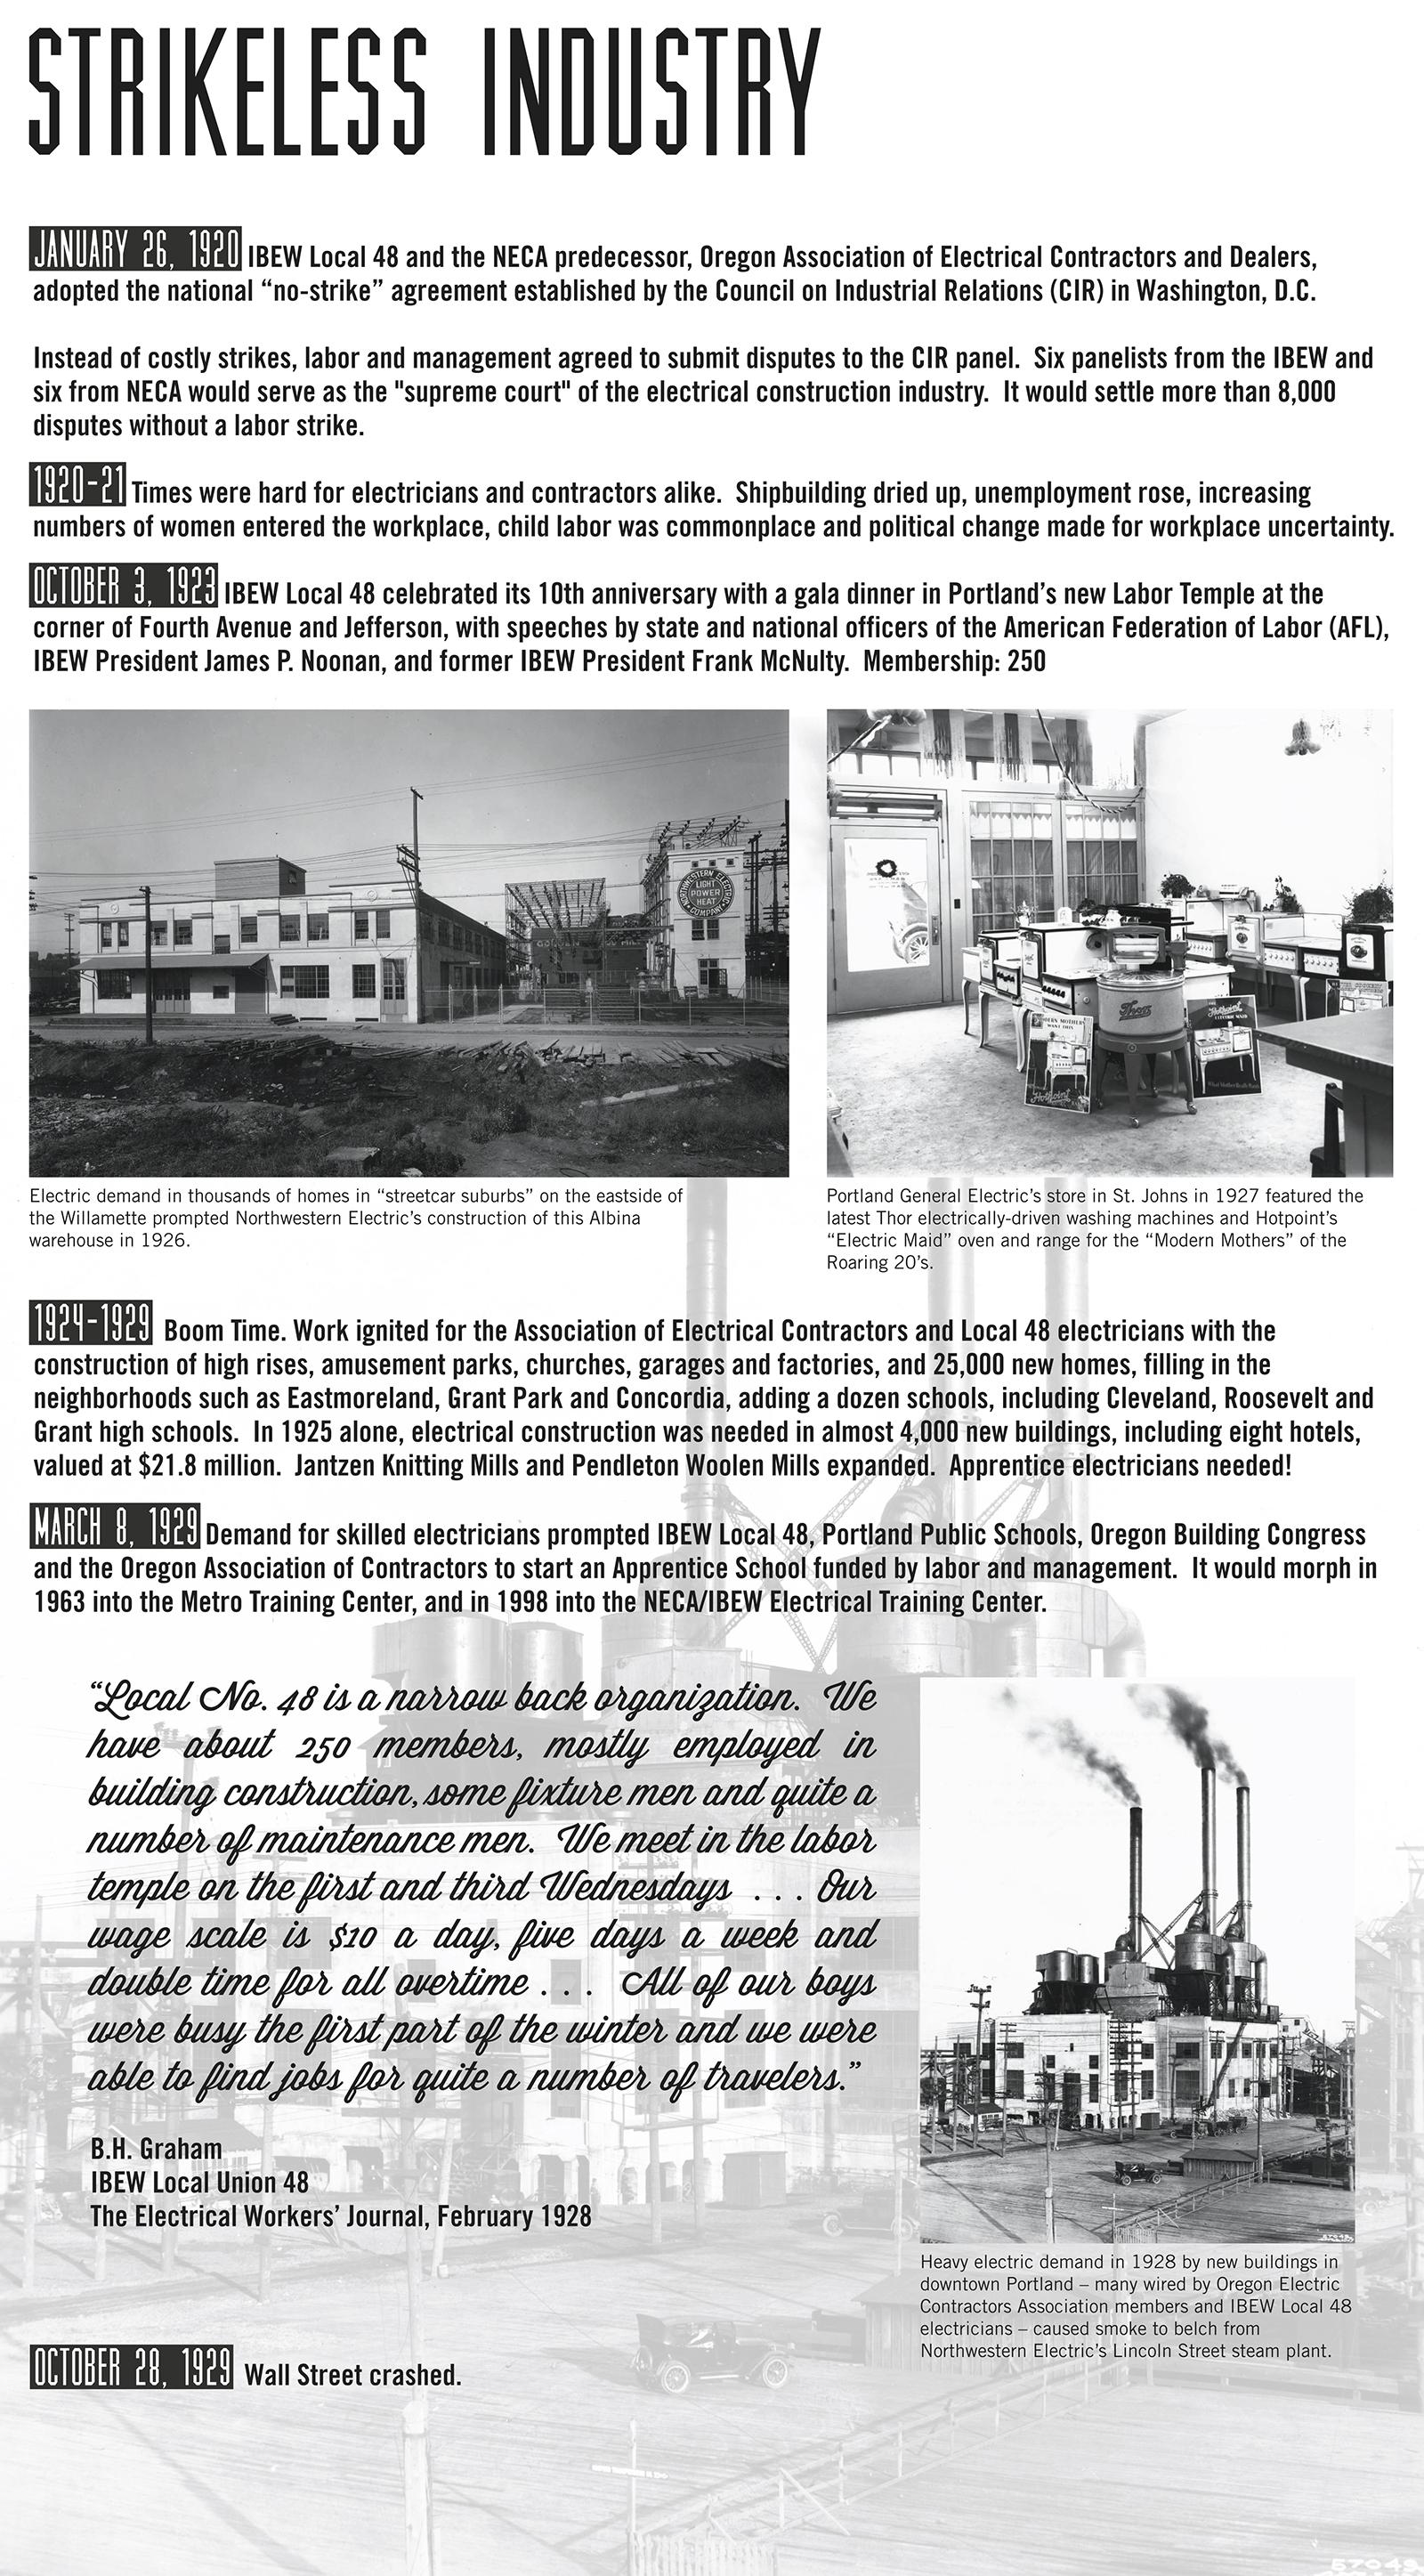 History - NECA/IBEW 48